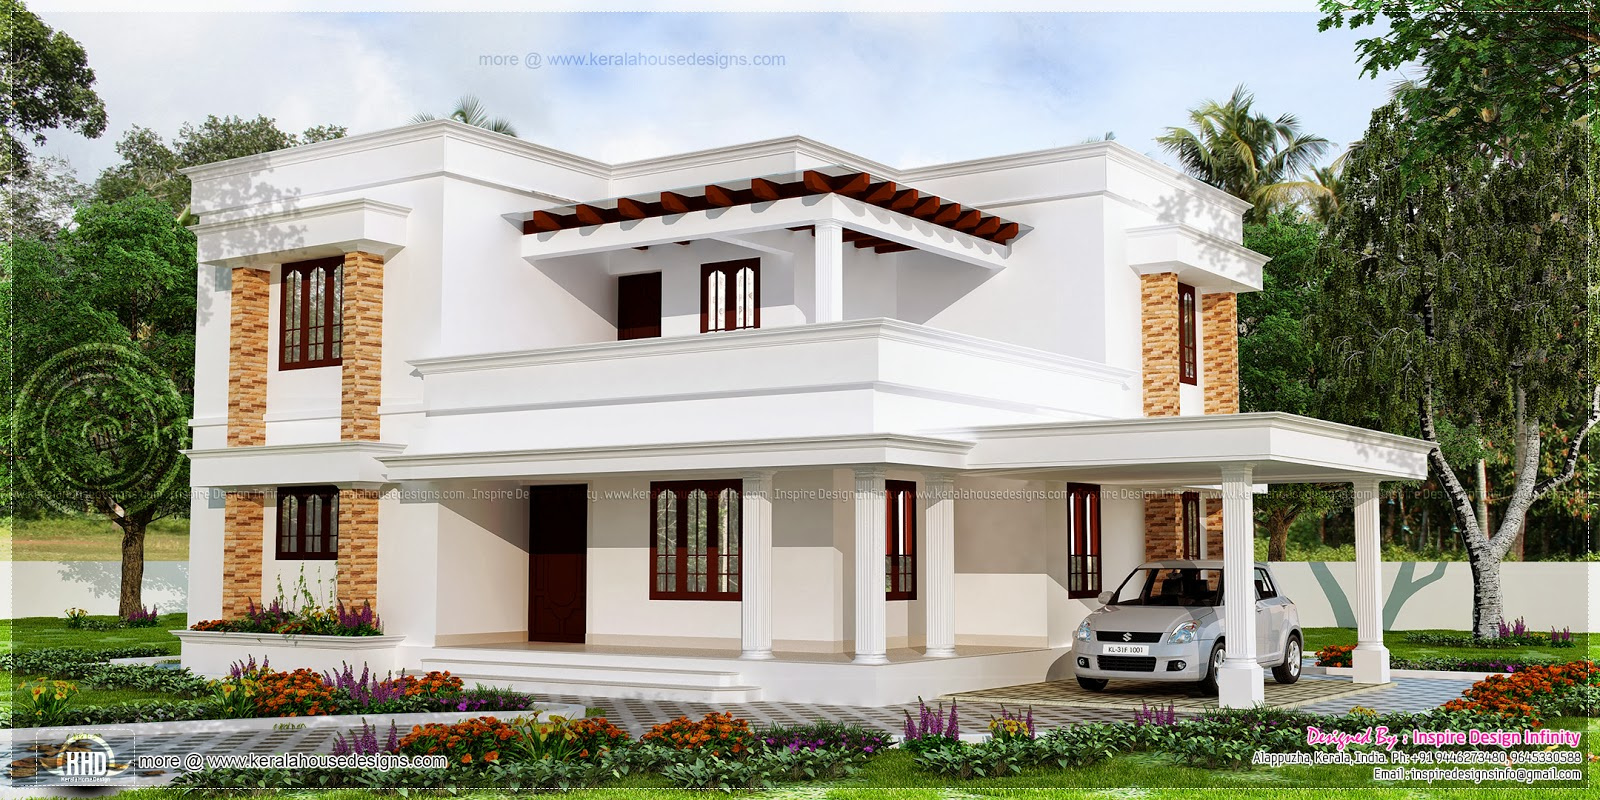 Old Fashioned Villa Home Designs Model - Home Decorating Inspiration ...